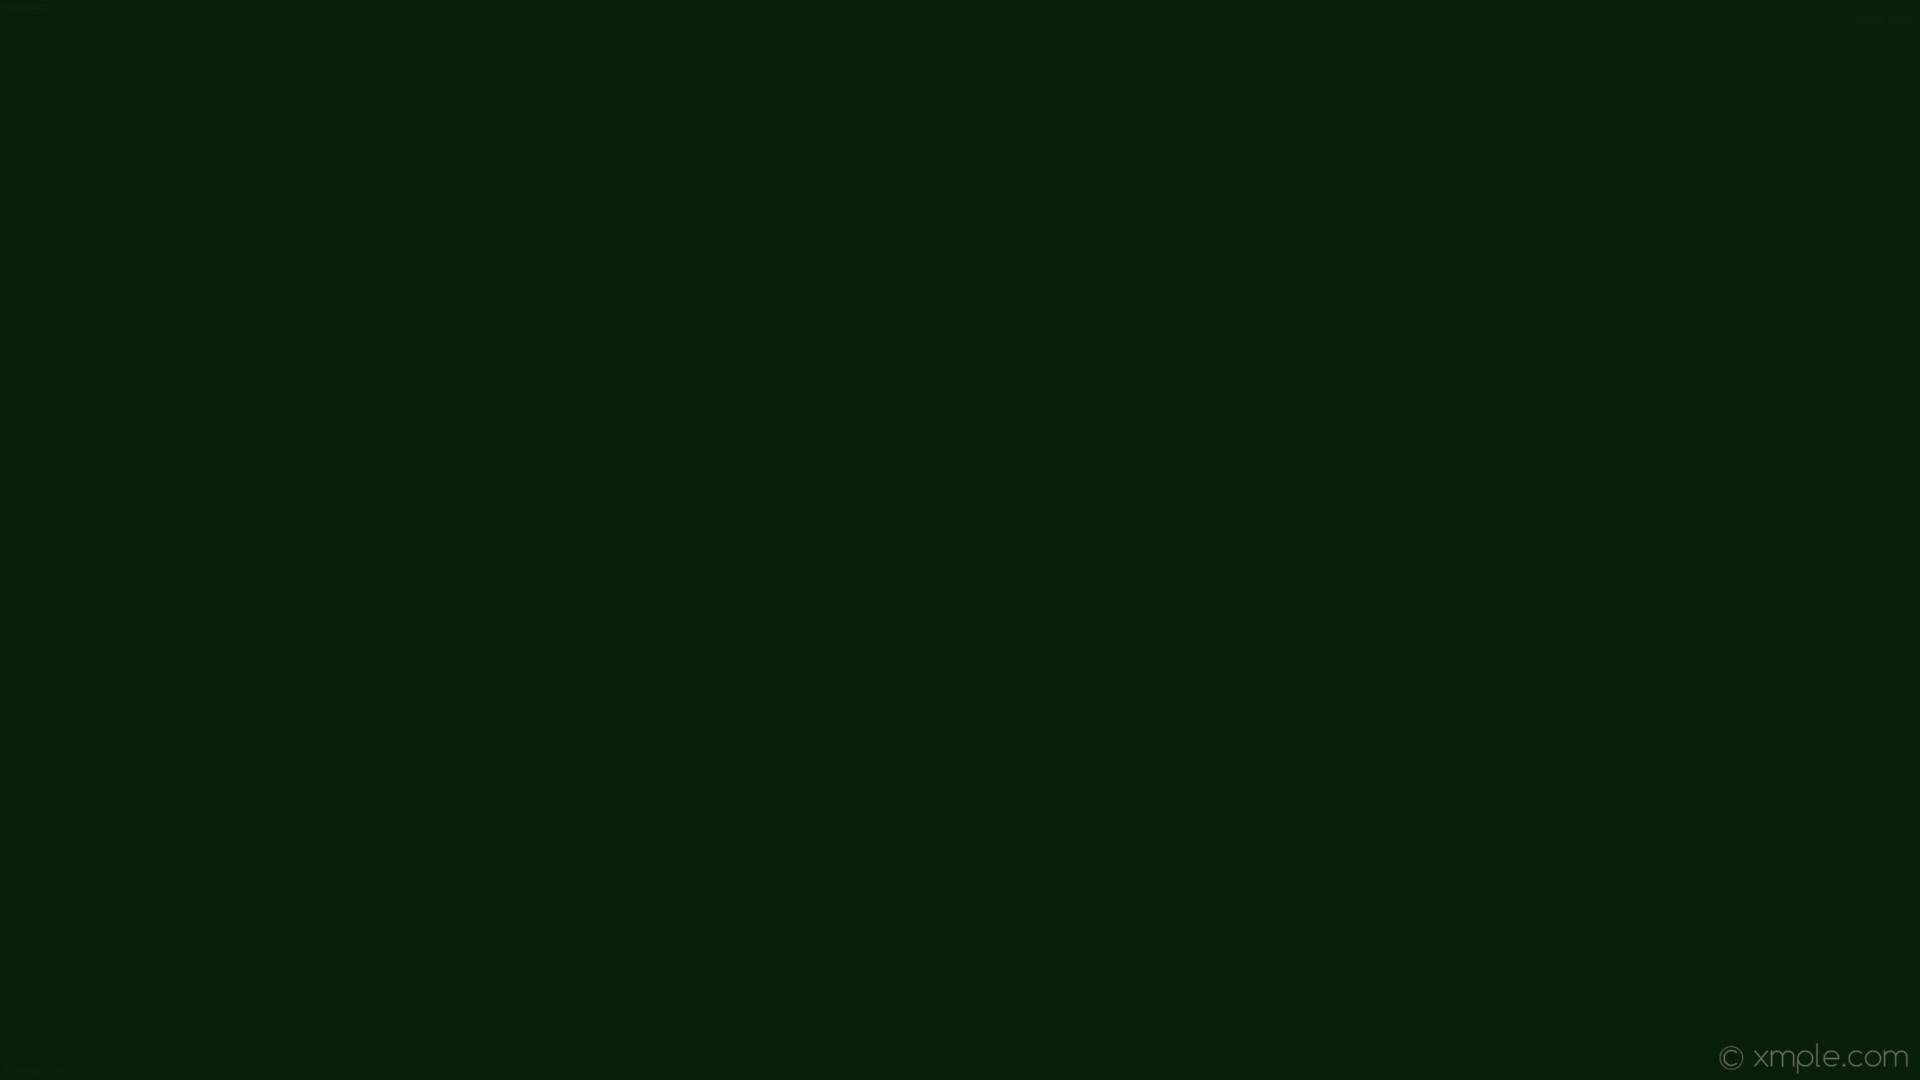 wallpaper green single one colour solid color plain dark green #0a1f09